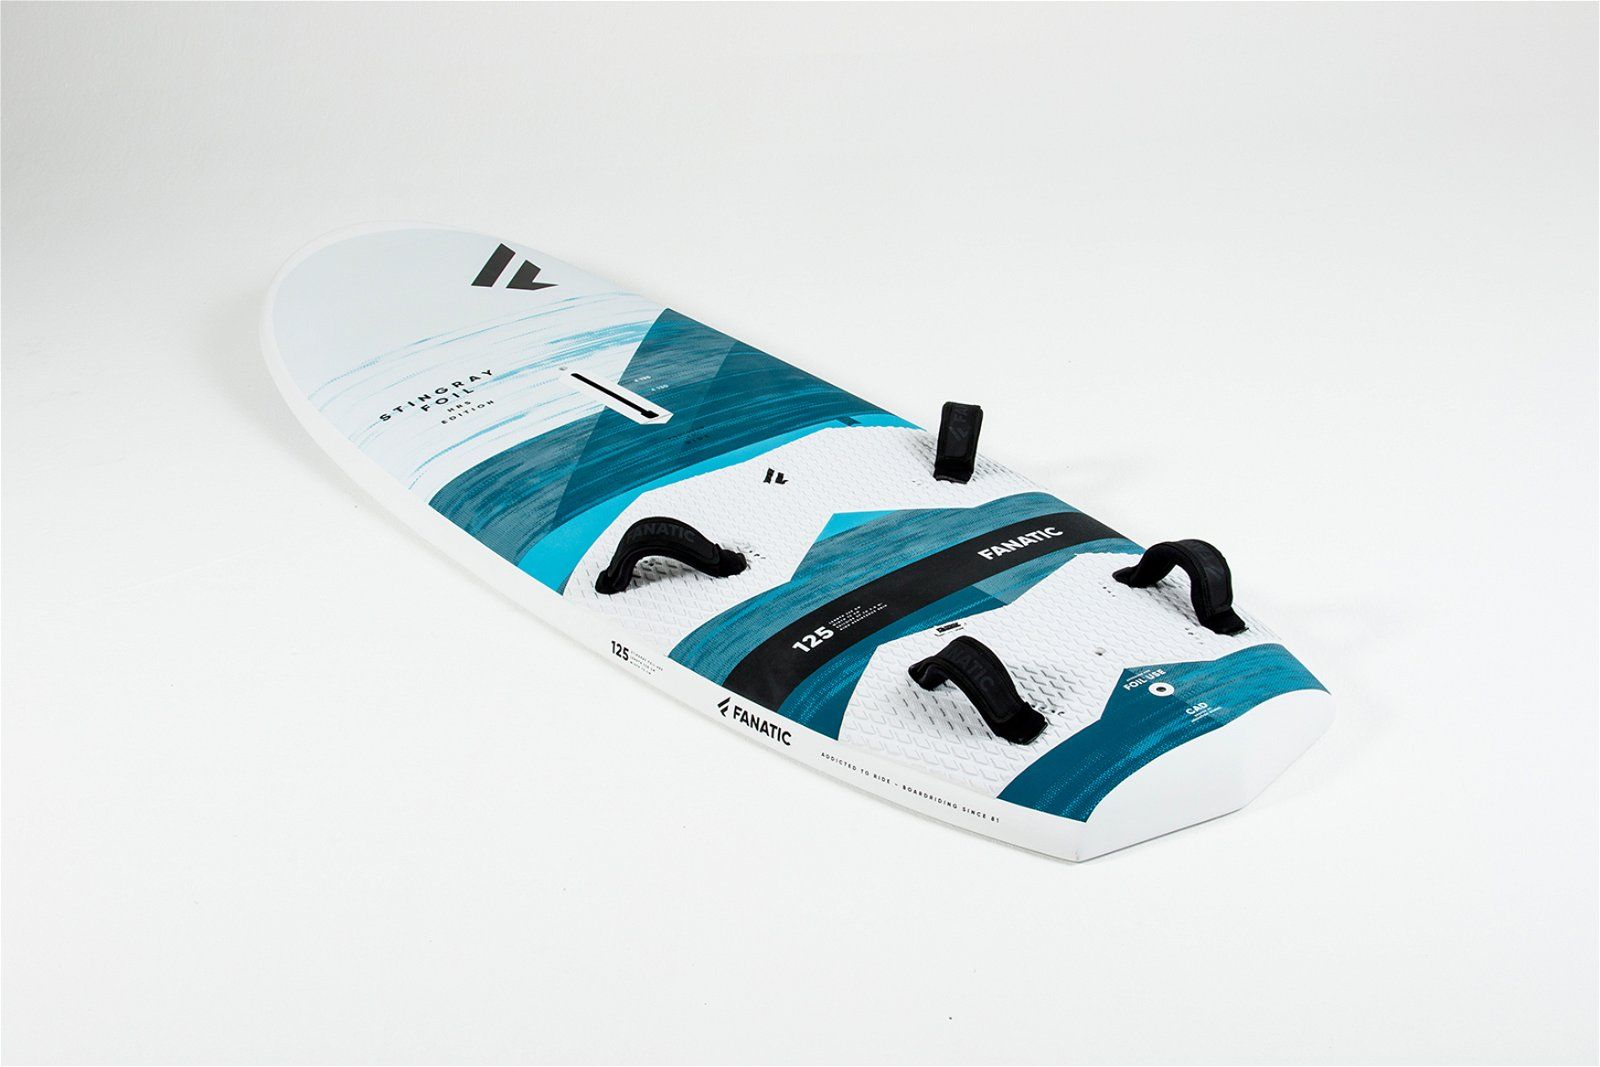 Stingray Foil HRS